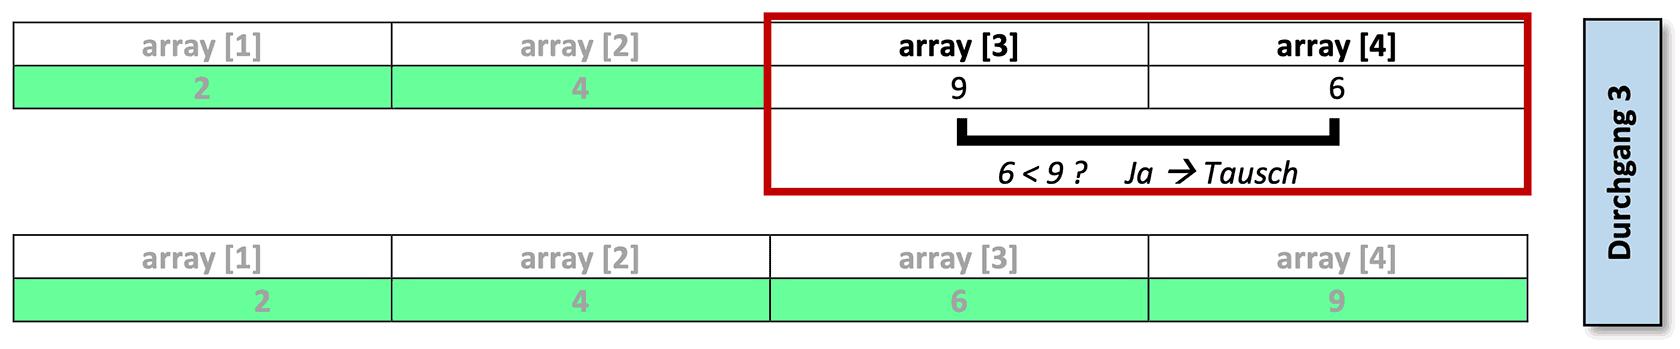 Selectionsort-Beispiel: Durchgang 3